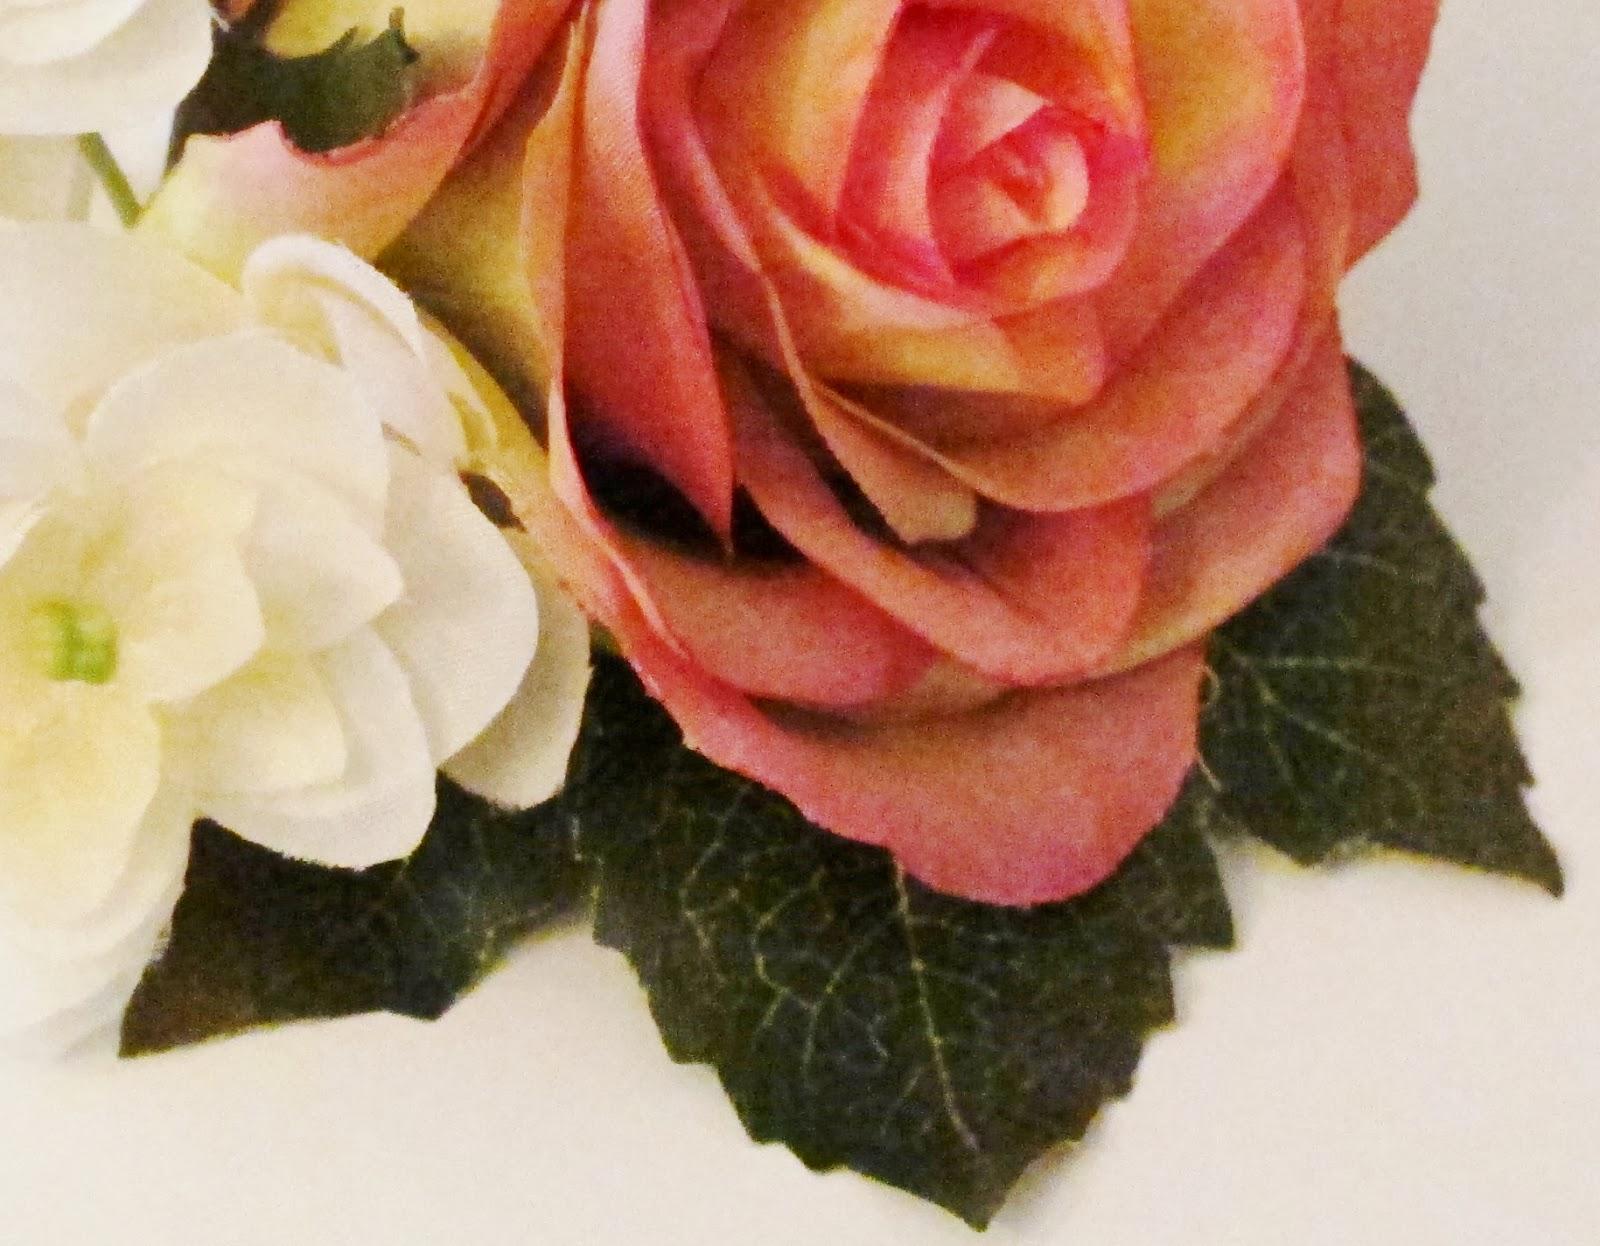 bonnieprojects vintage romantic bouquets and boutonnieres. Black Bedroom Furniture Sets. Home Design Ideas